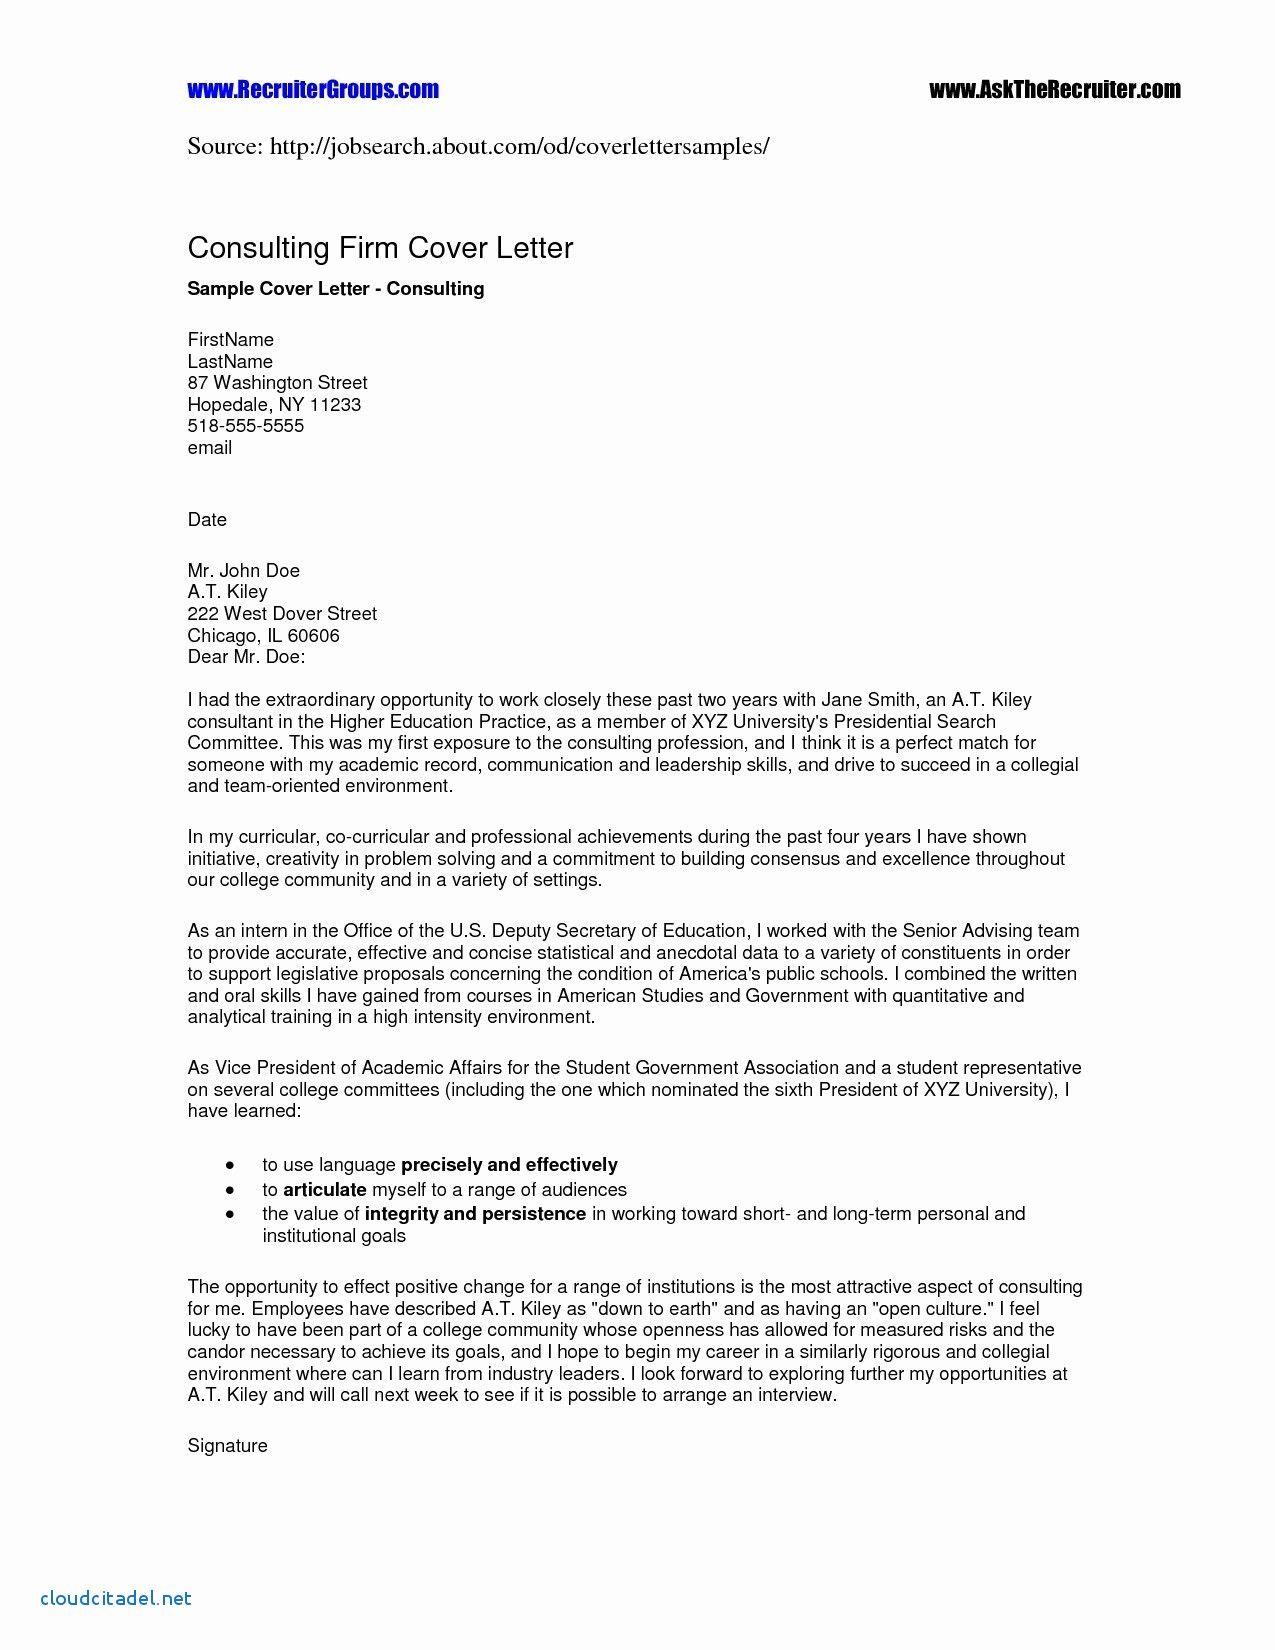 Cover Letter Template Higher Education Job cover letter